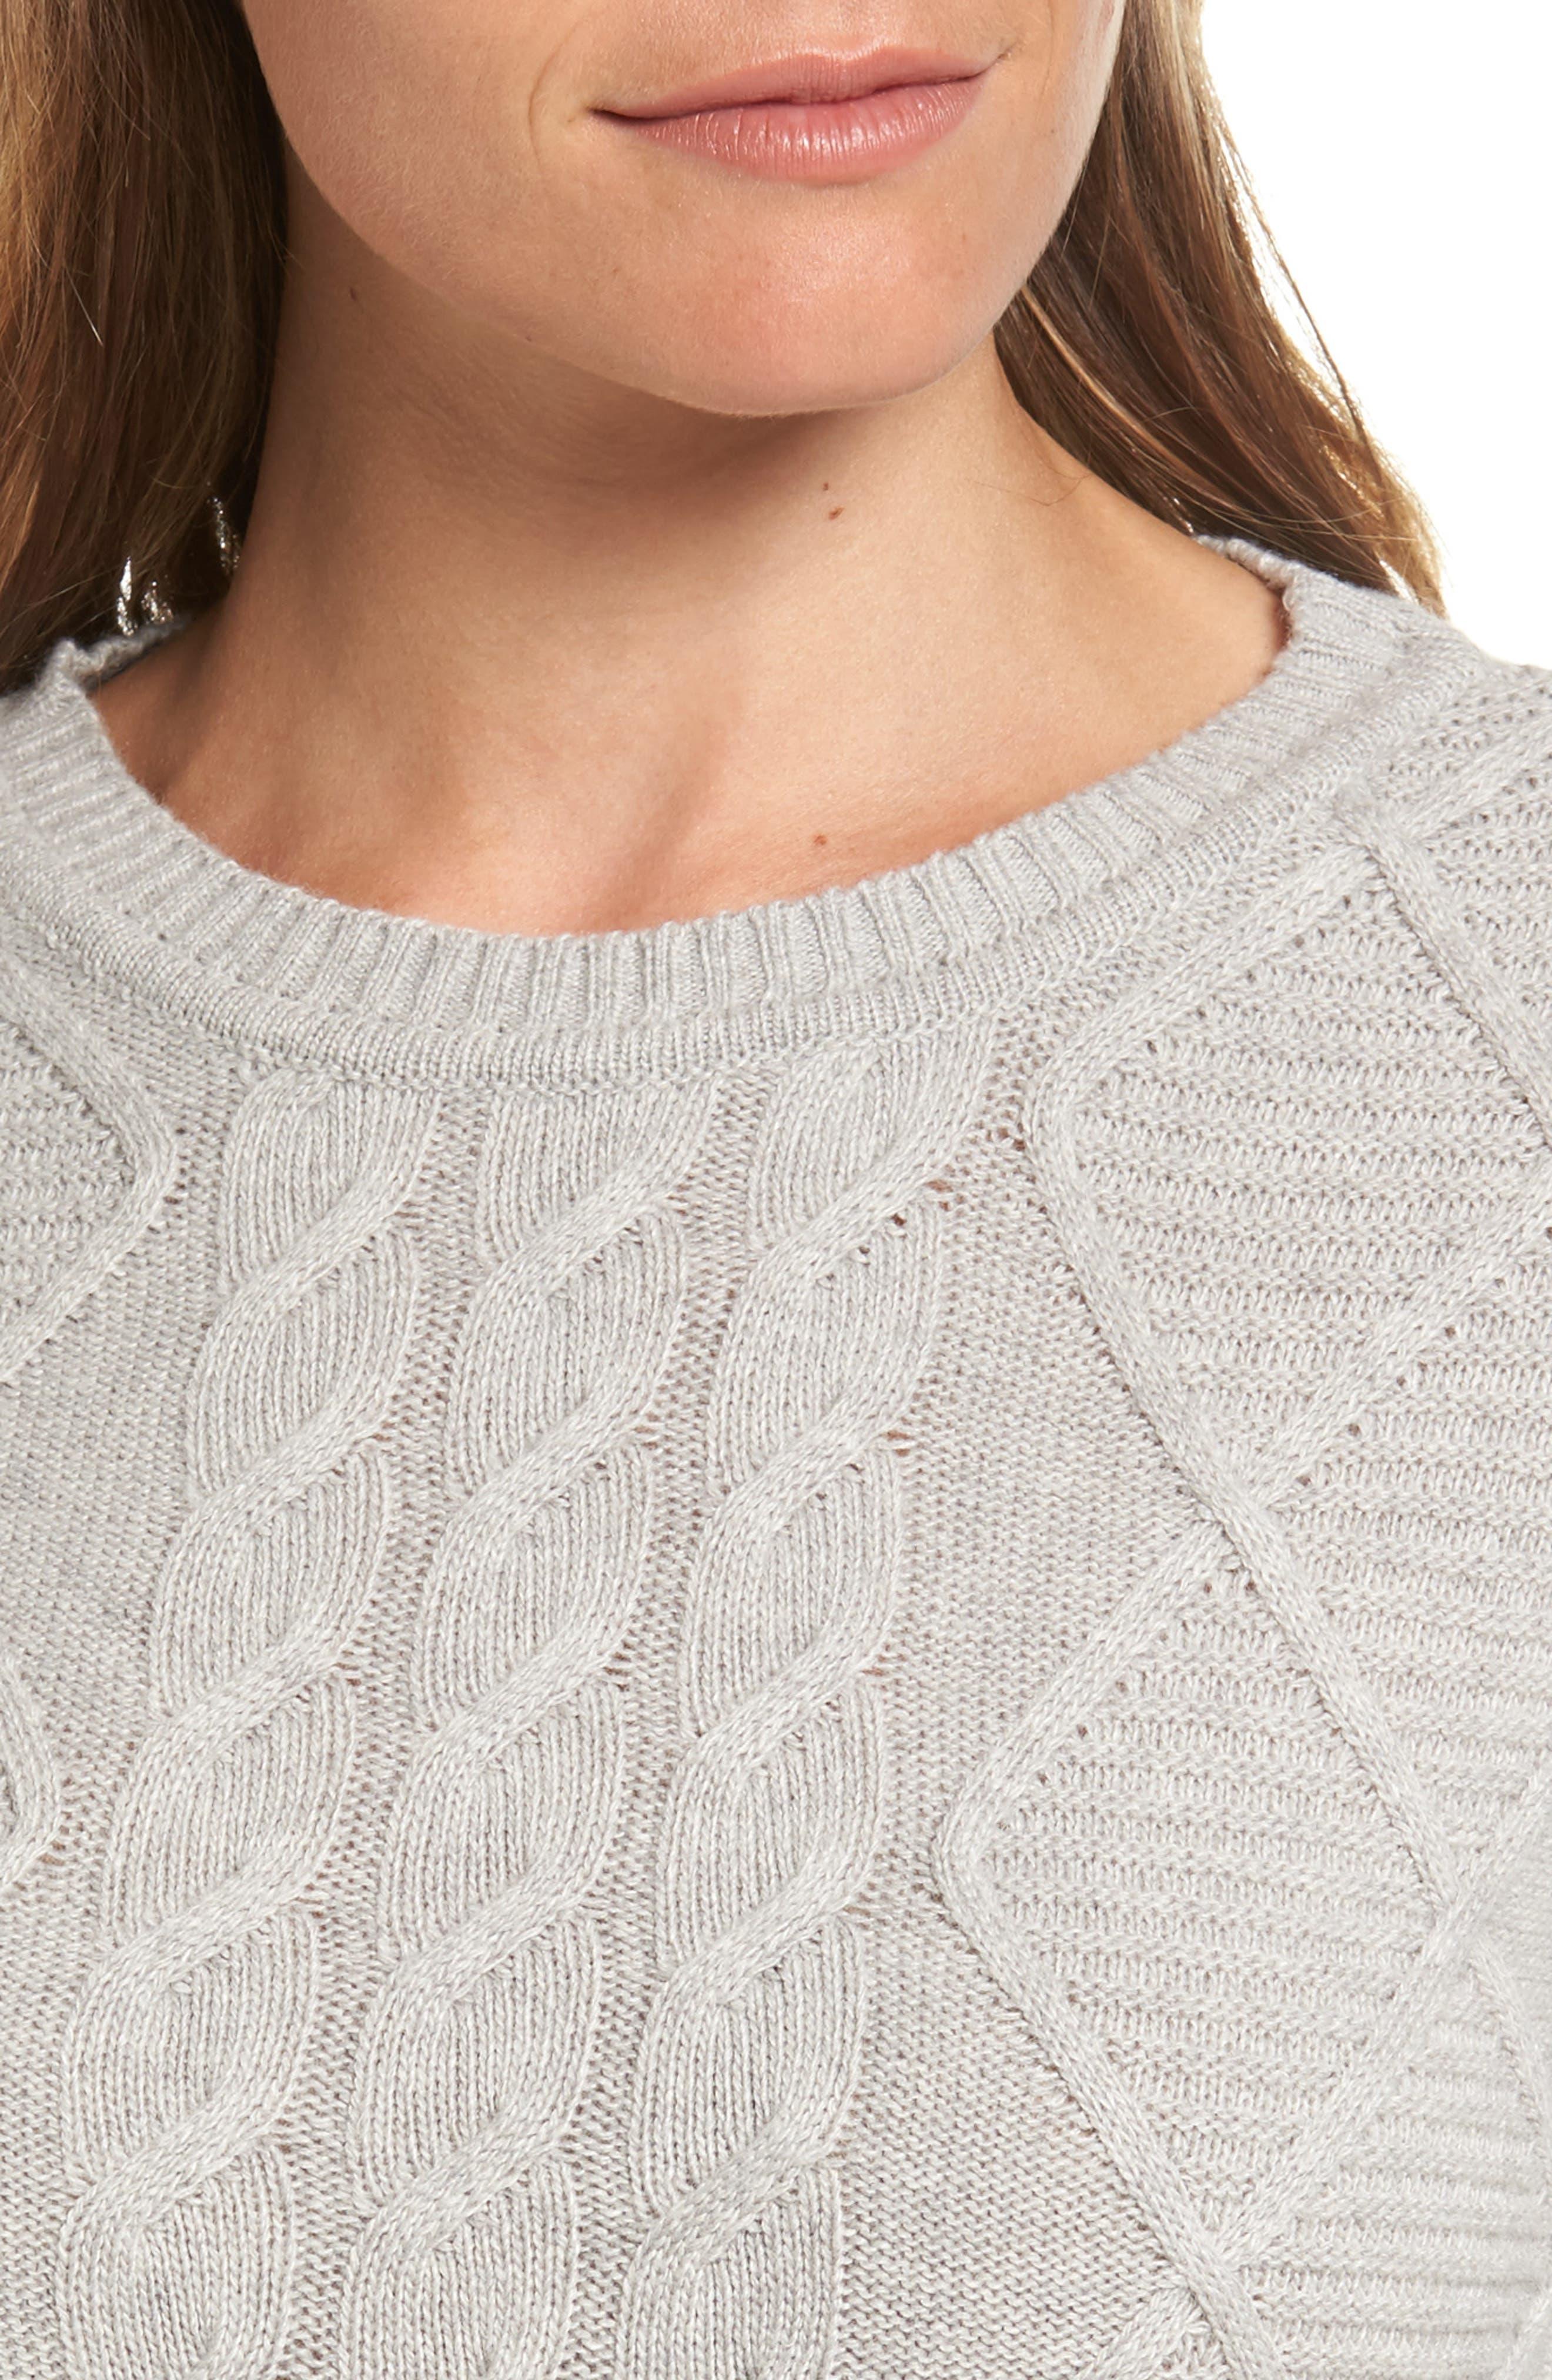 Emmanuel Cable Knit Sweater Dress,                             Alternate thumbnail 4, color,                             050